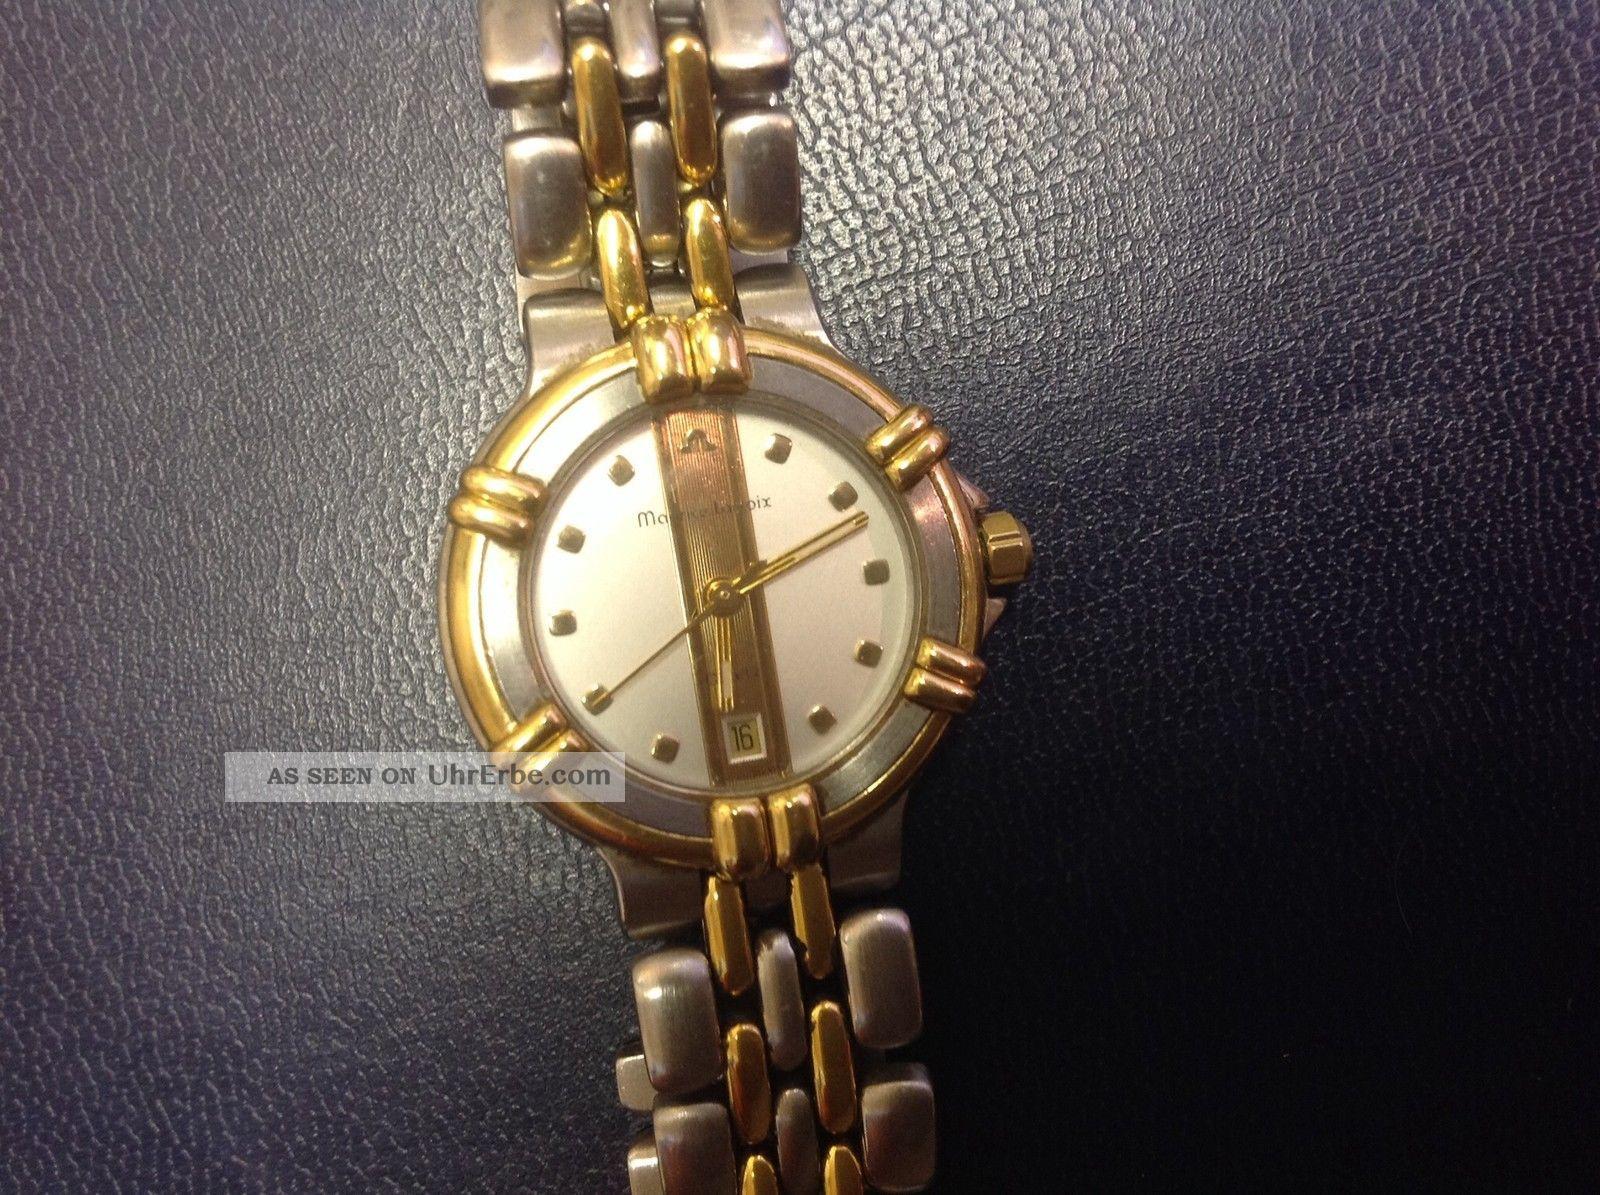 Damenuhr Der Marke Maurice Lacroix Armbanduhren Bild